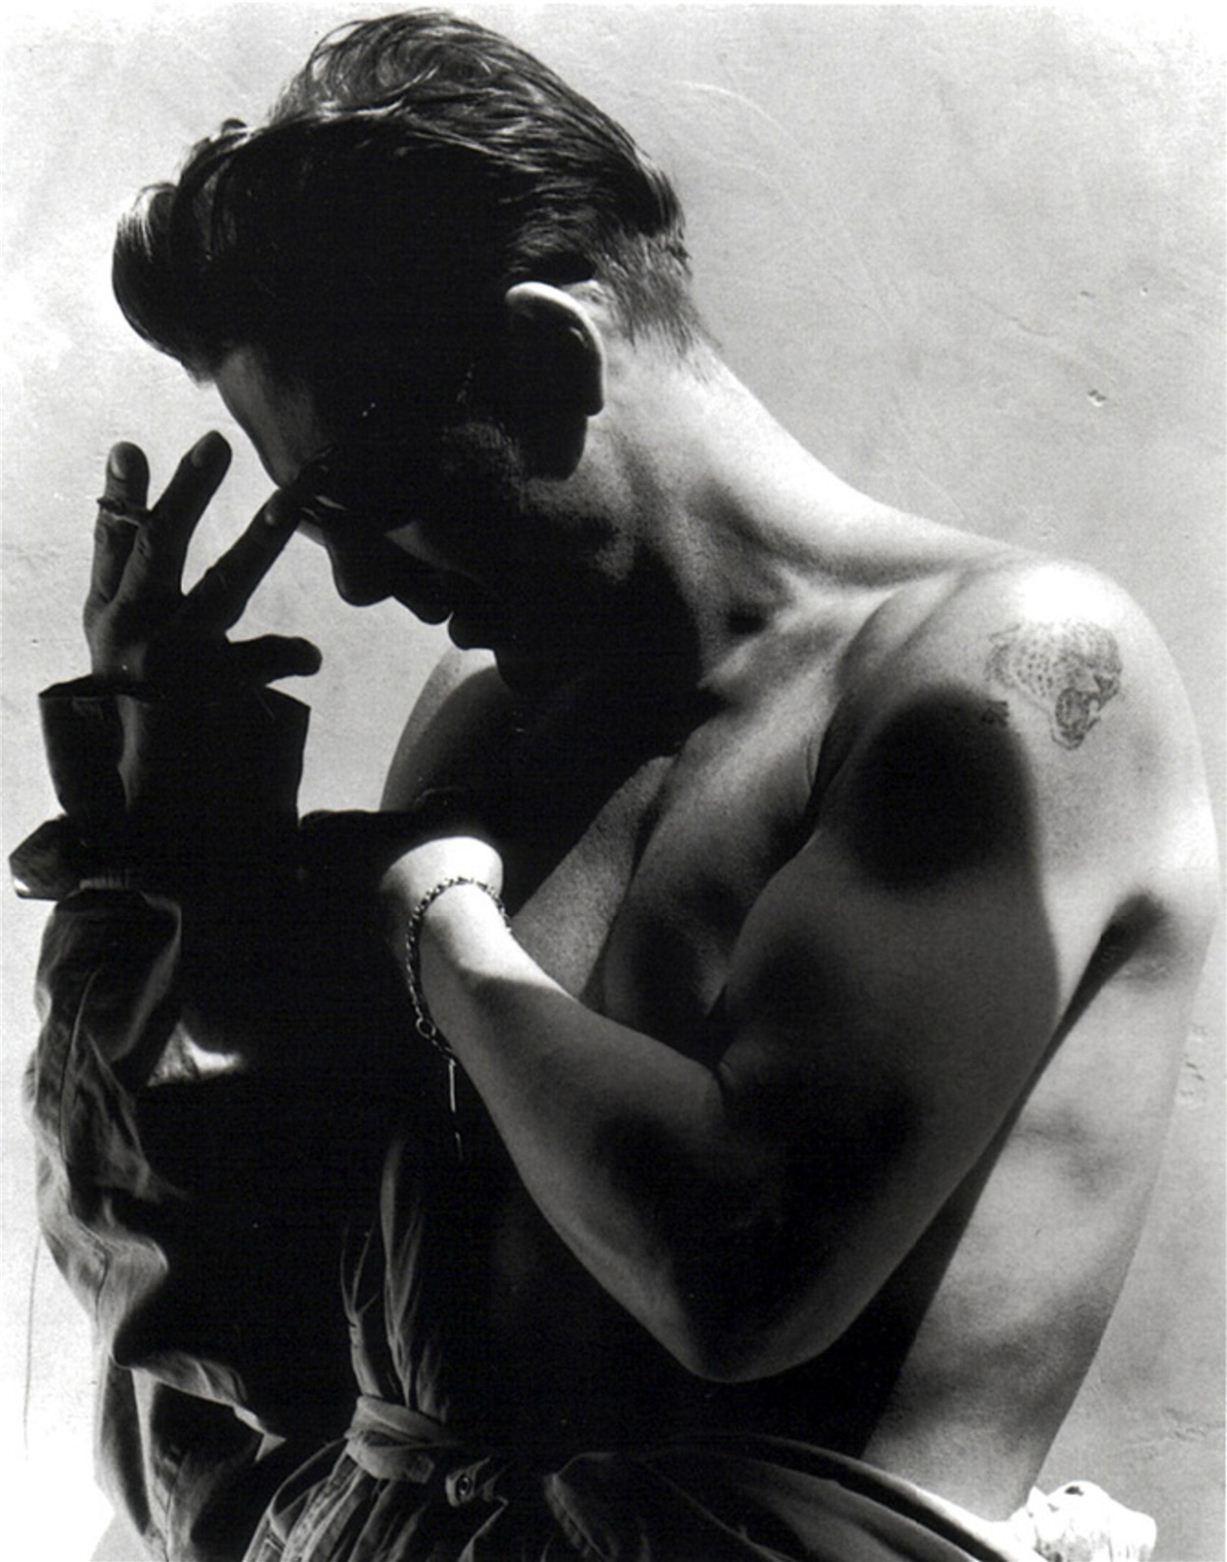 Mickey Rourke / Микки Рурк - портрет фотографа Грега Гормана / Greg Gorman